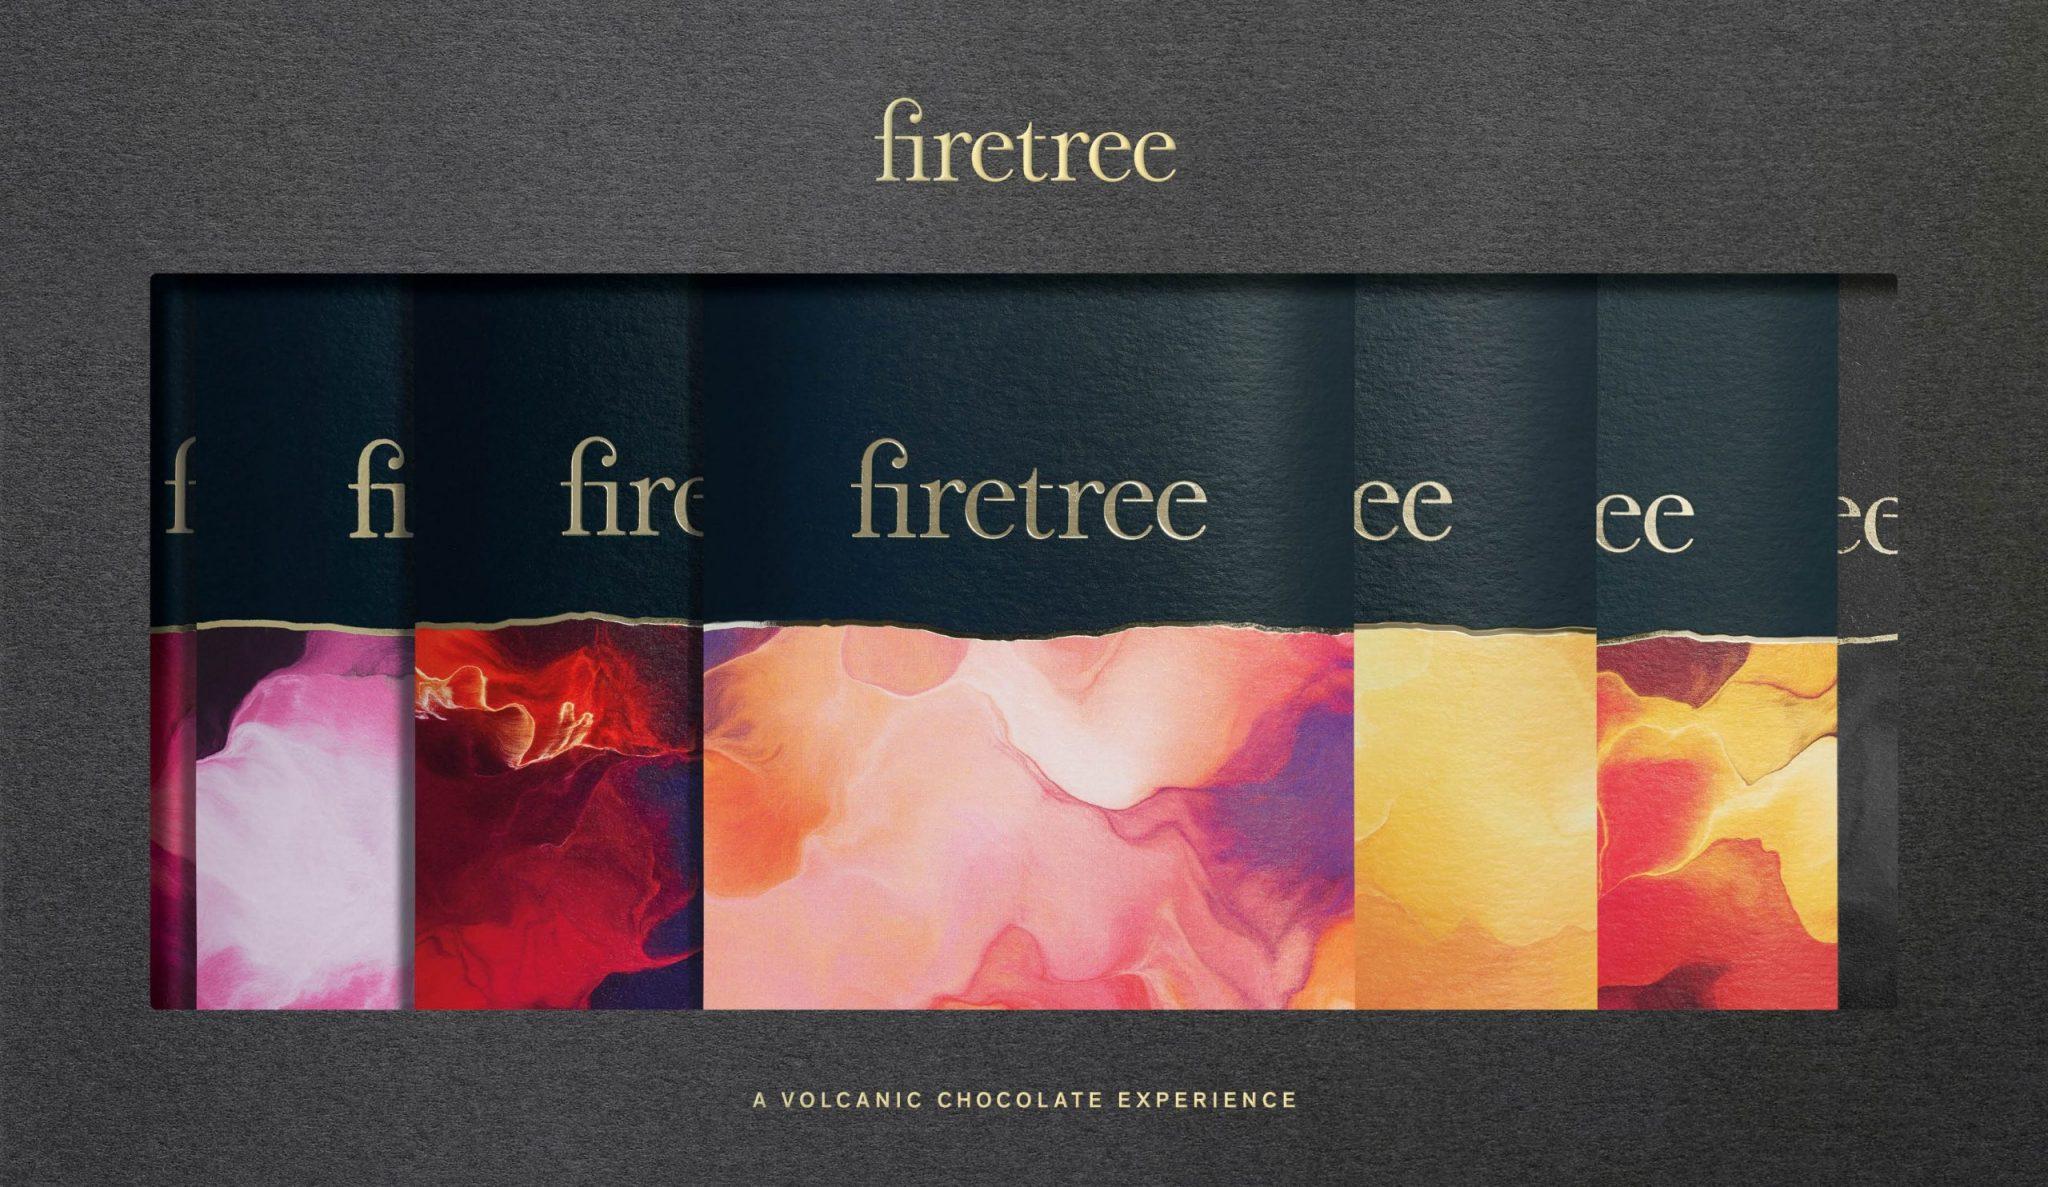 Firetree product